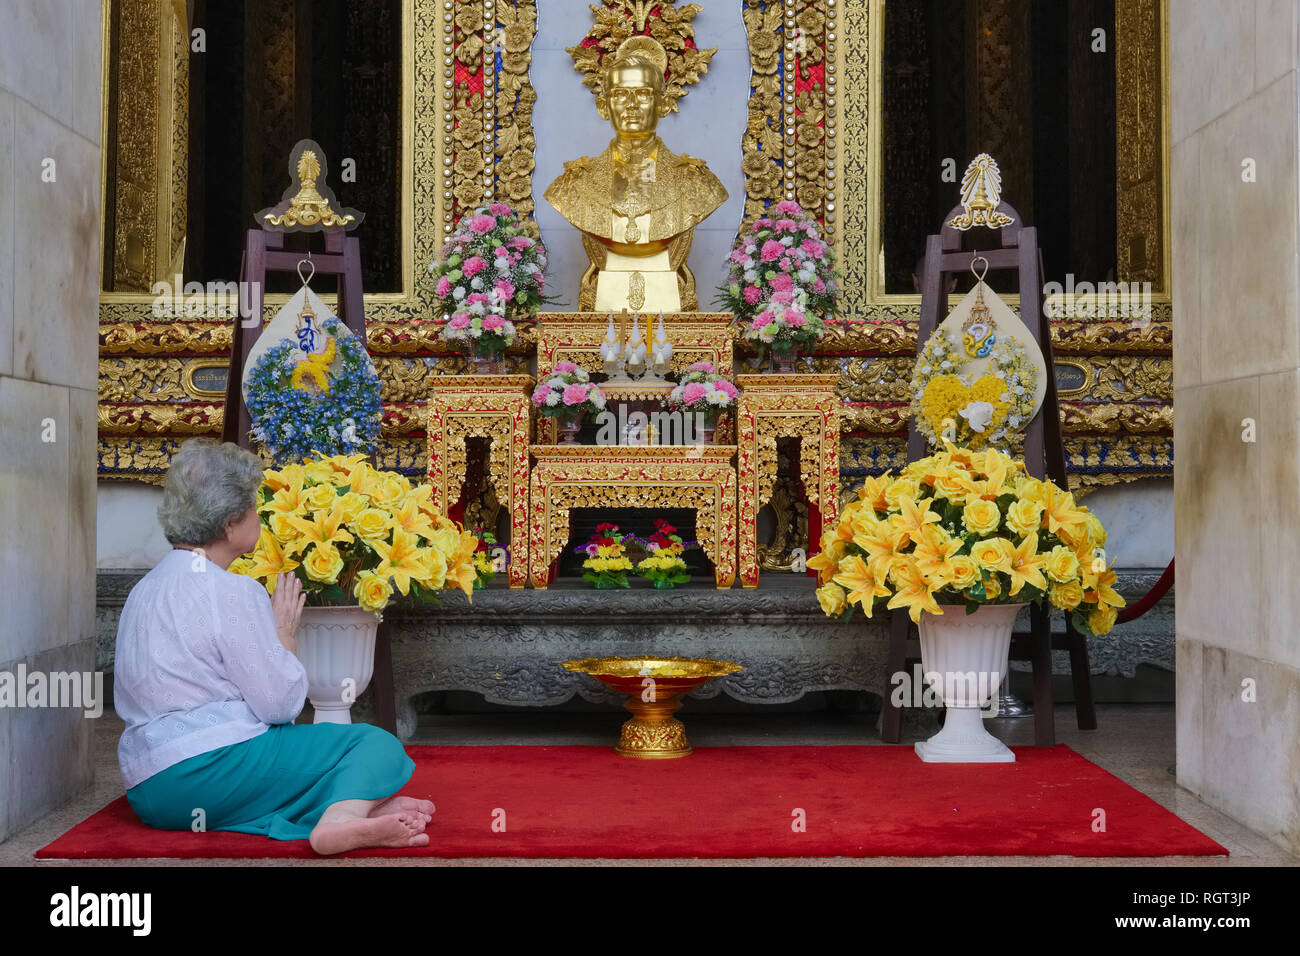 A woman praying in front of a bust of former Thai king Bhumipol Adulyadej, Wat Boworniwet, Bangkok, Thailand - Stock Image